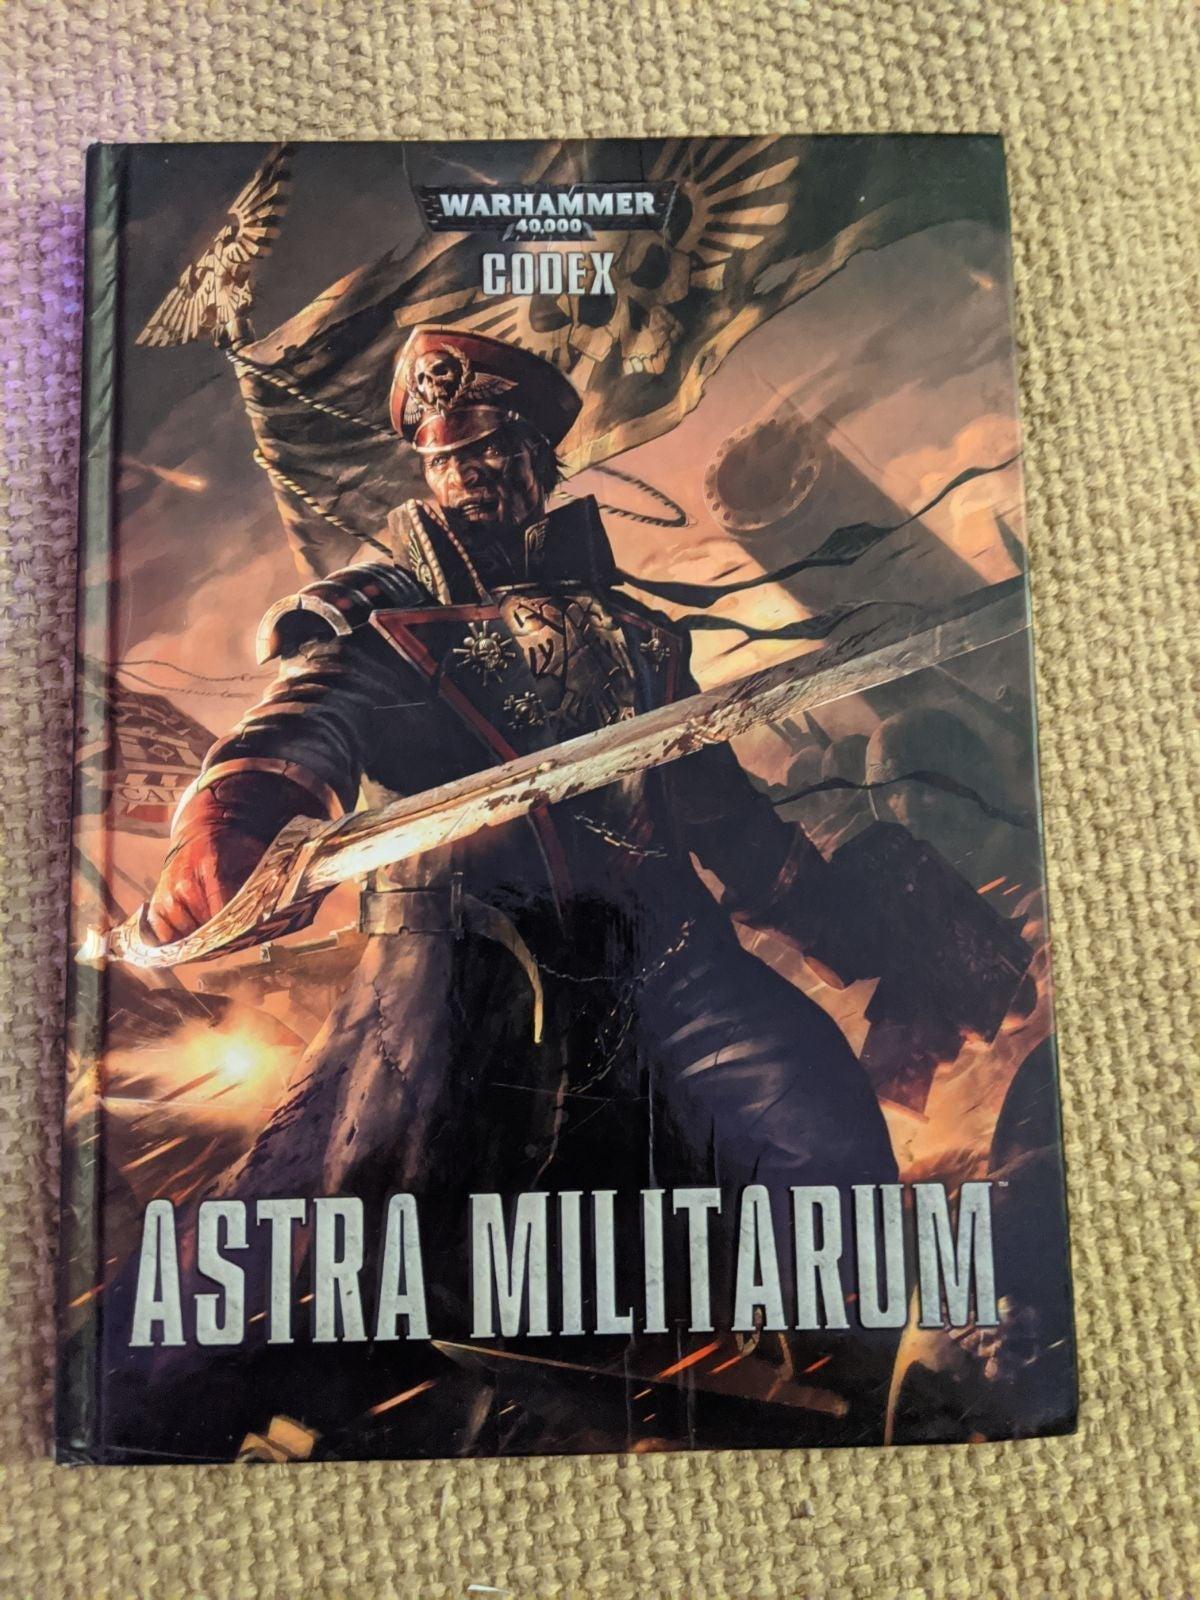 Warhammer 40k Astra militarum 7th editio